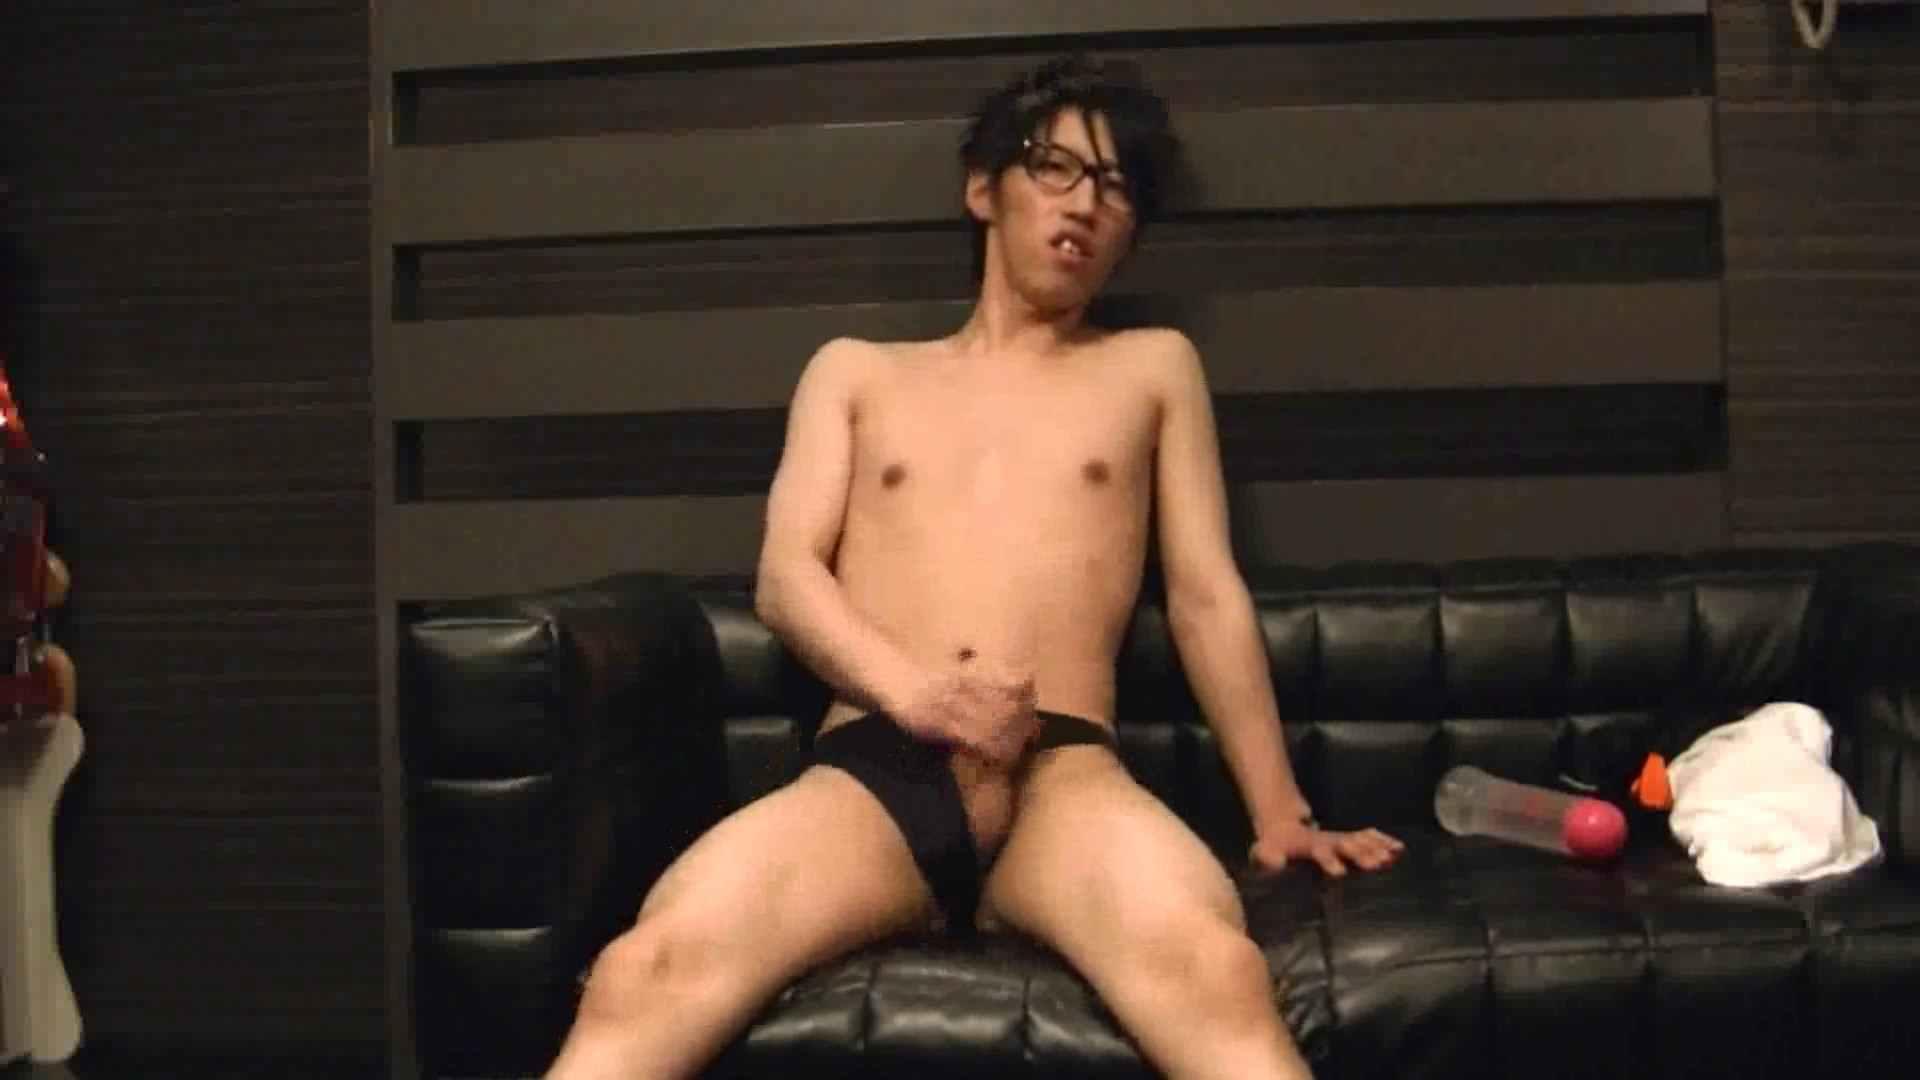 ONA見せカーニバル!! Vol3 男まつり ゲイ無料無修正画像 87枚 70